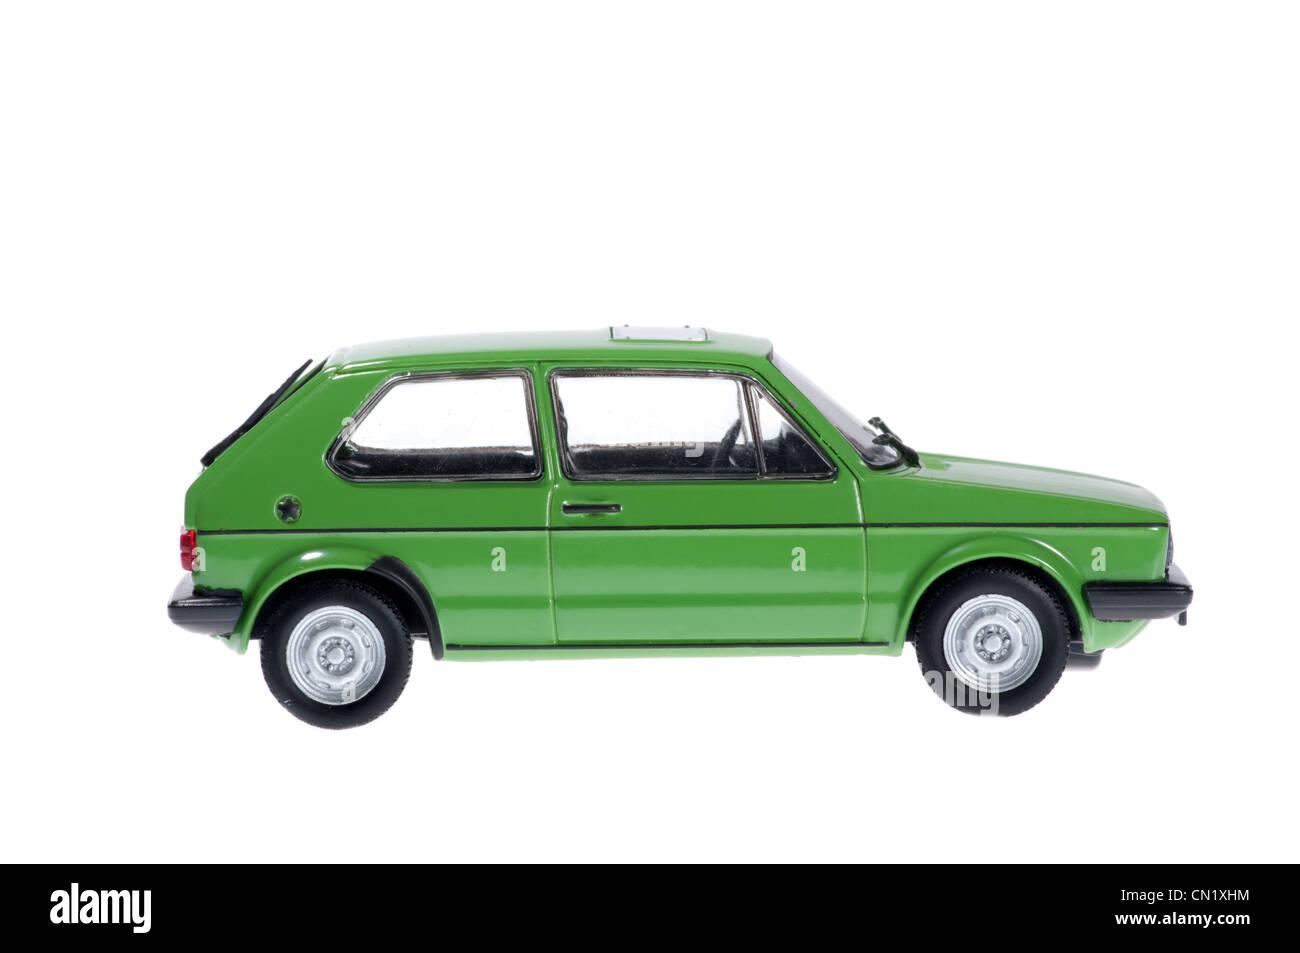 The model of old green volkswagen golf. - Stock Image